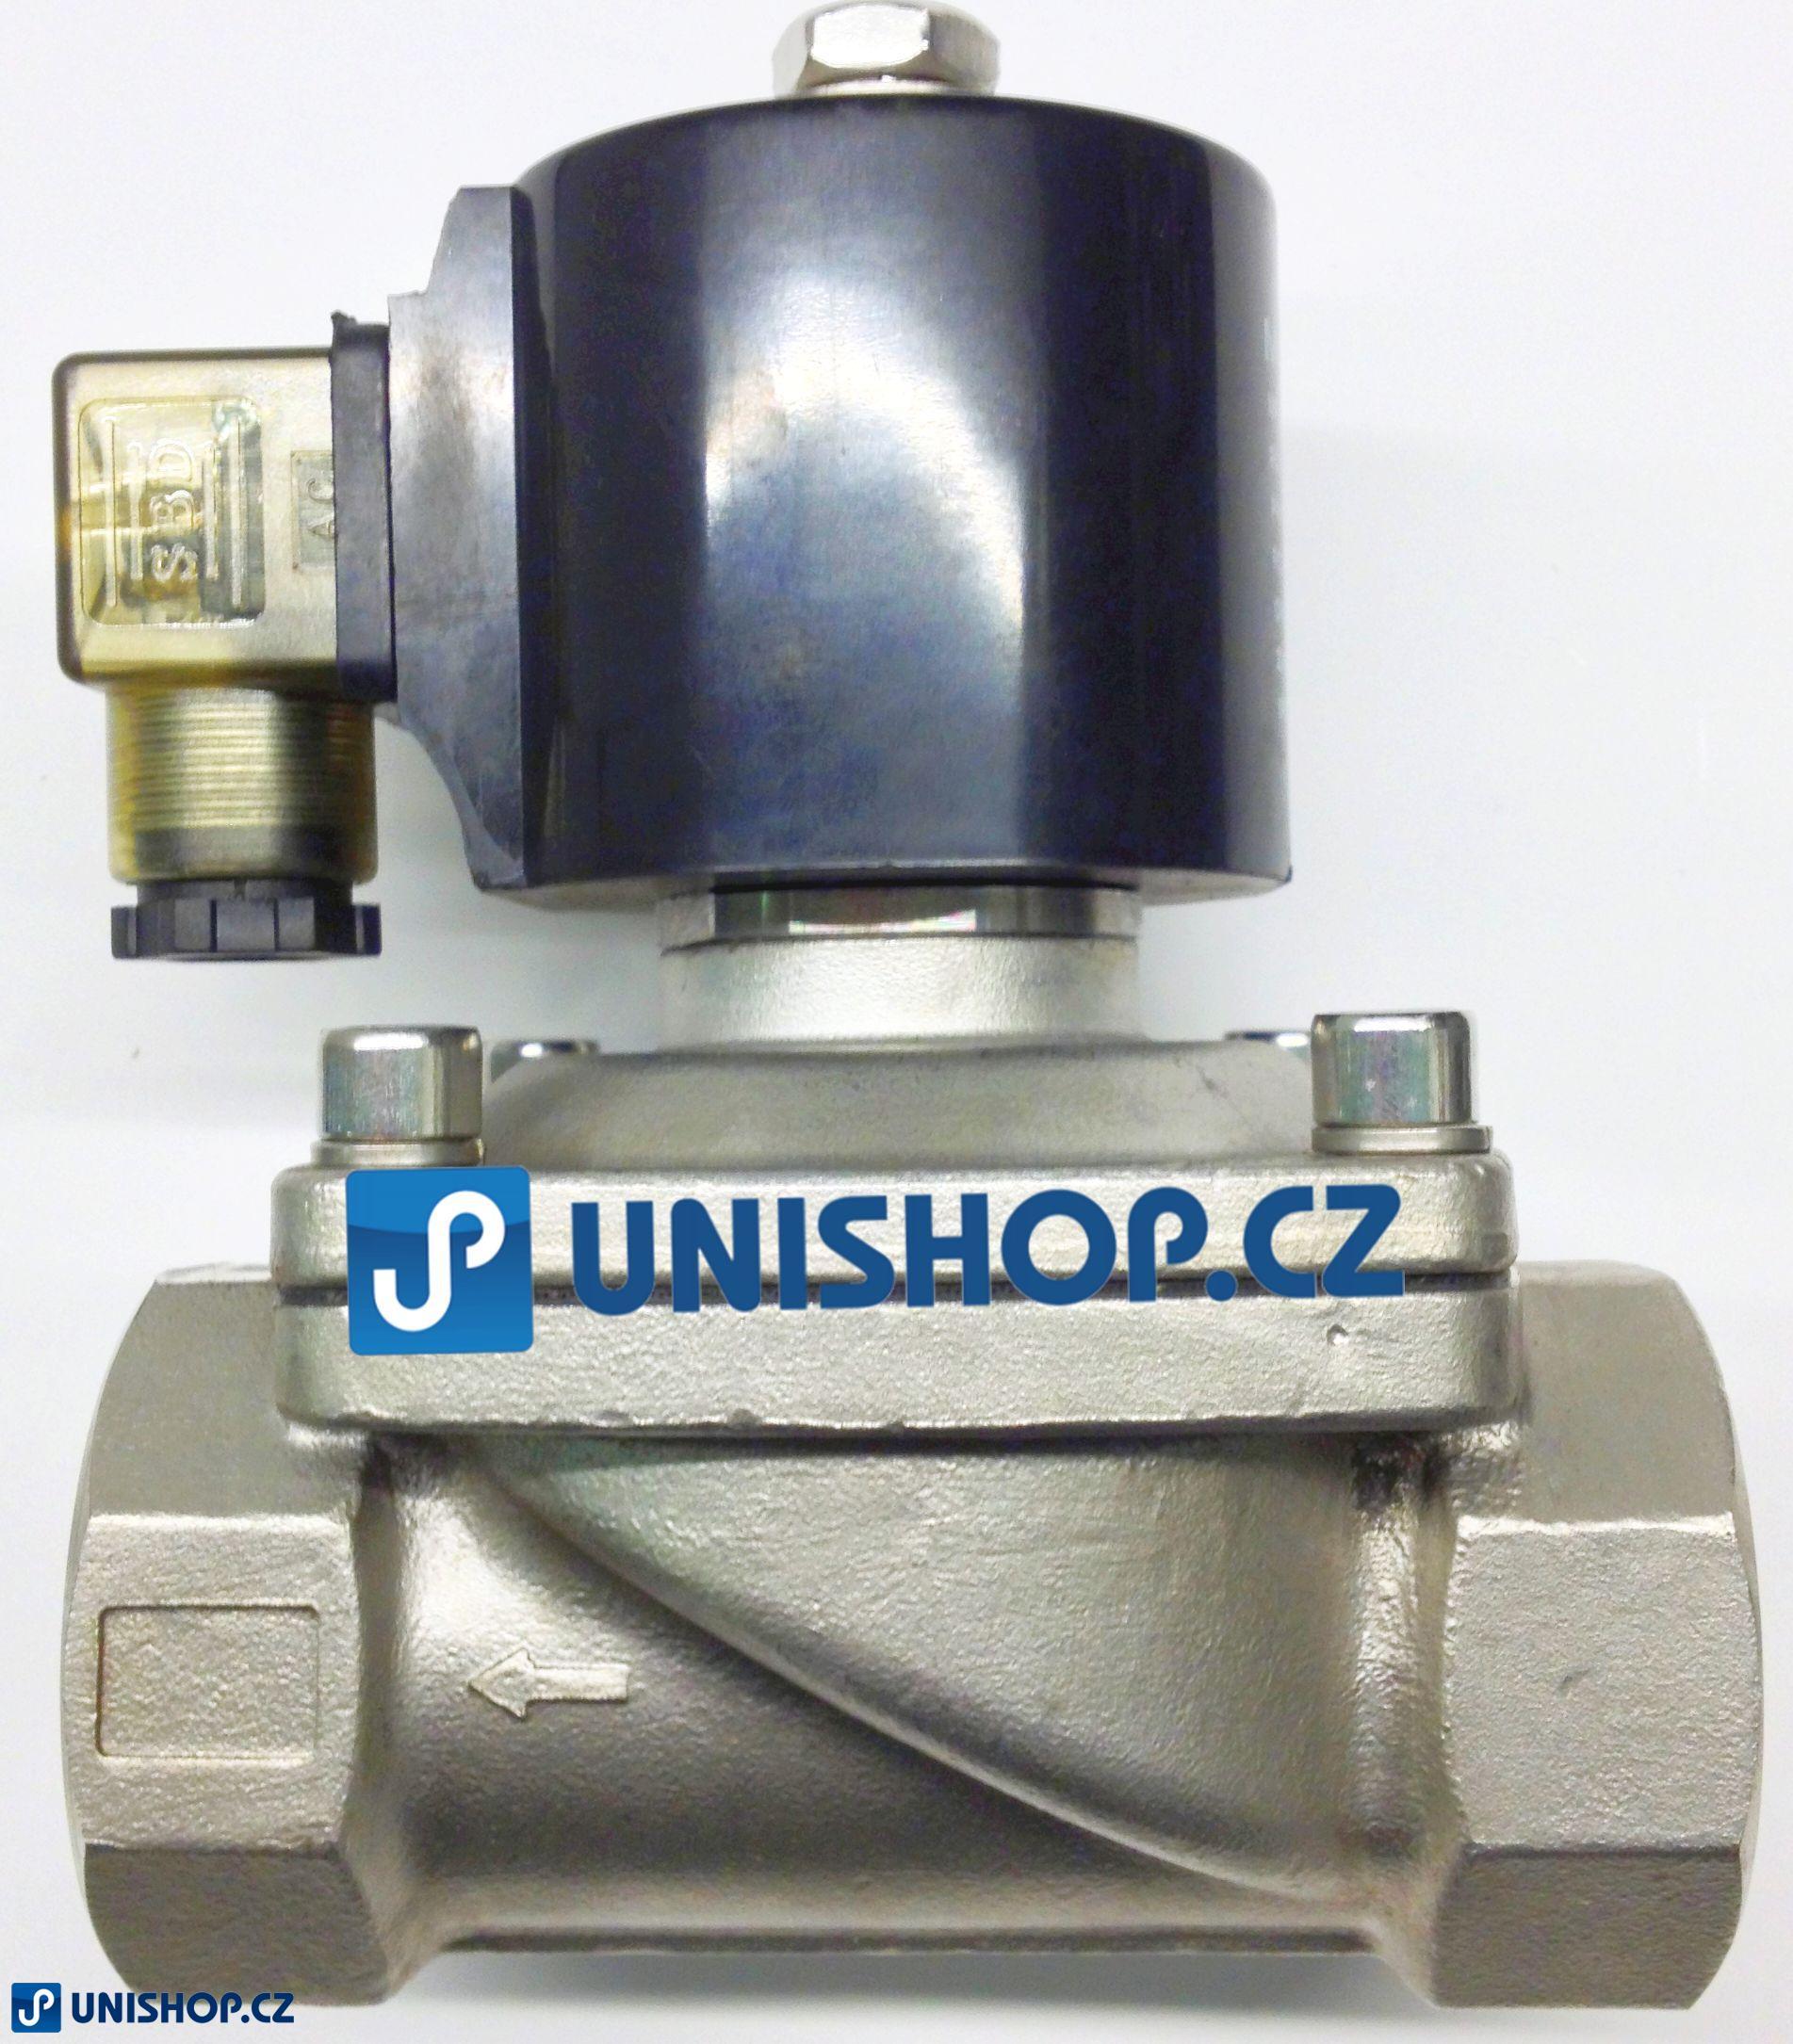 "AKCE MP-W400-40SV, NC, 230V AC, G 1 1/2"" - Elektromagnetický ventil"